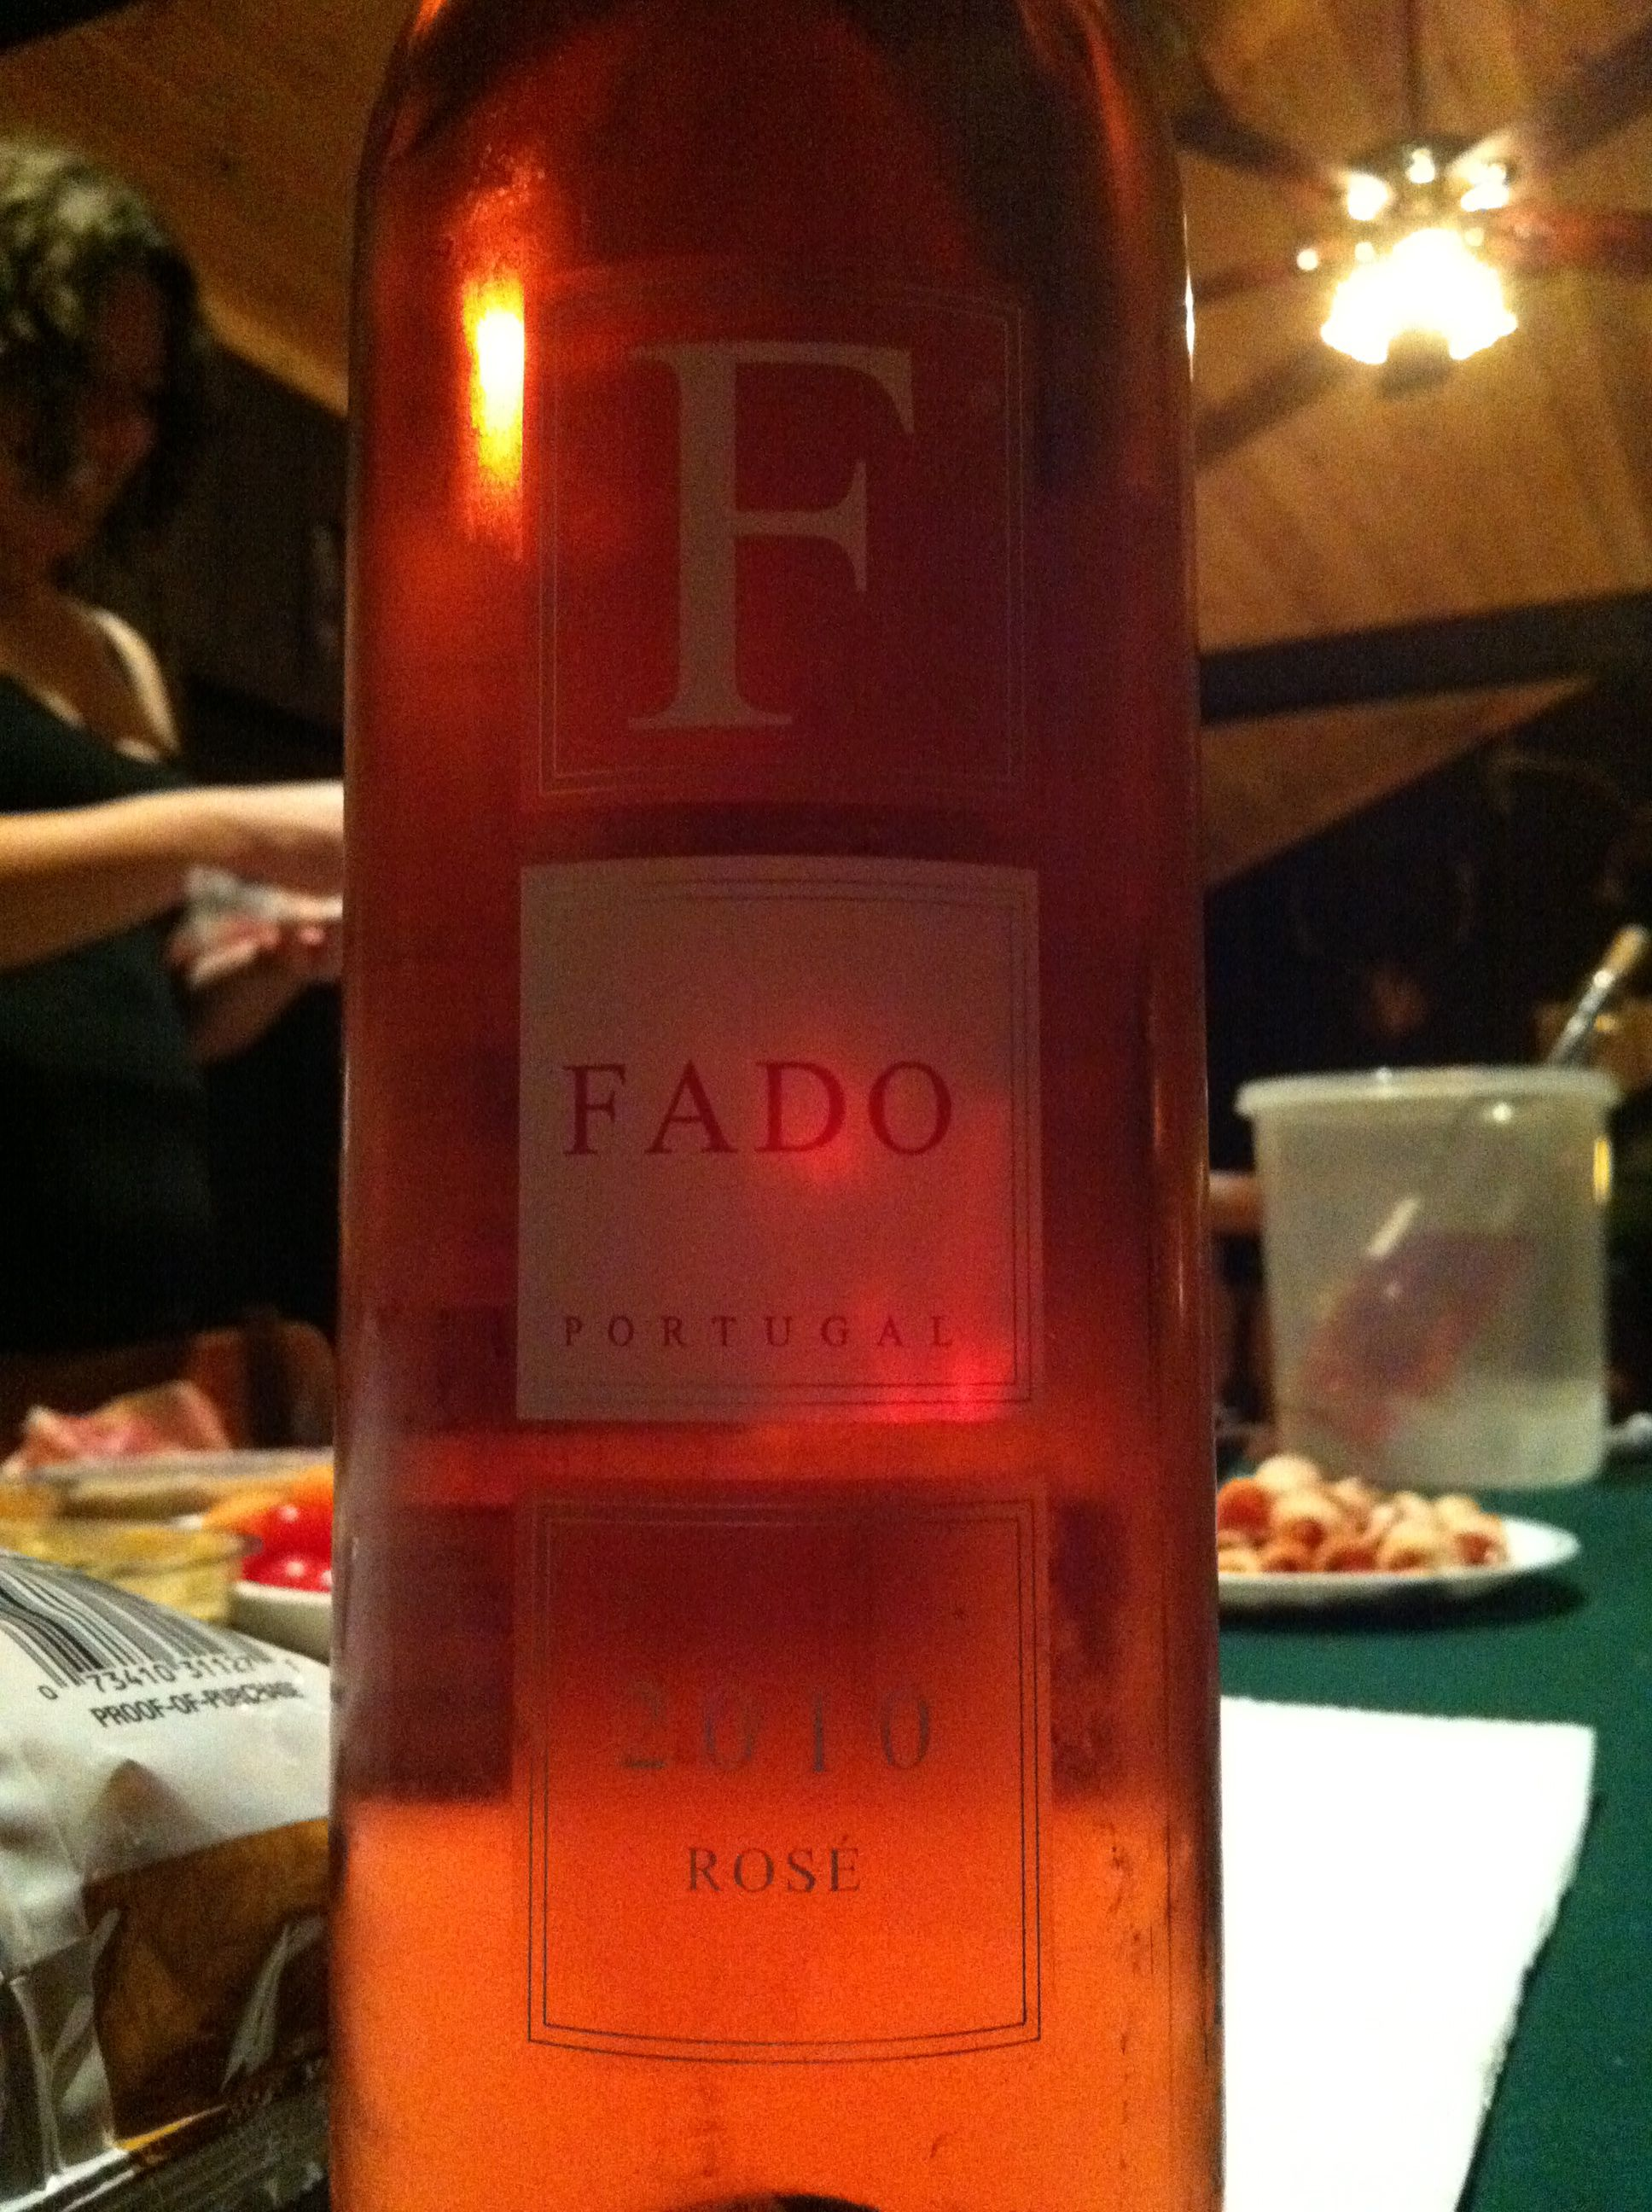 Fado Rose 2010 Wine Bottle Rose Wine Bottle Bottle